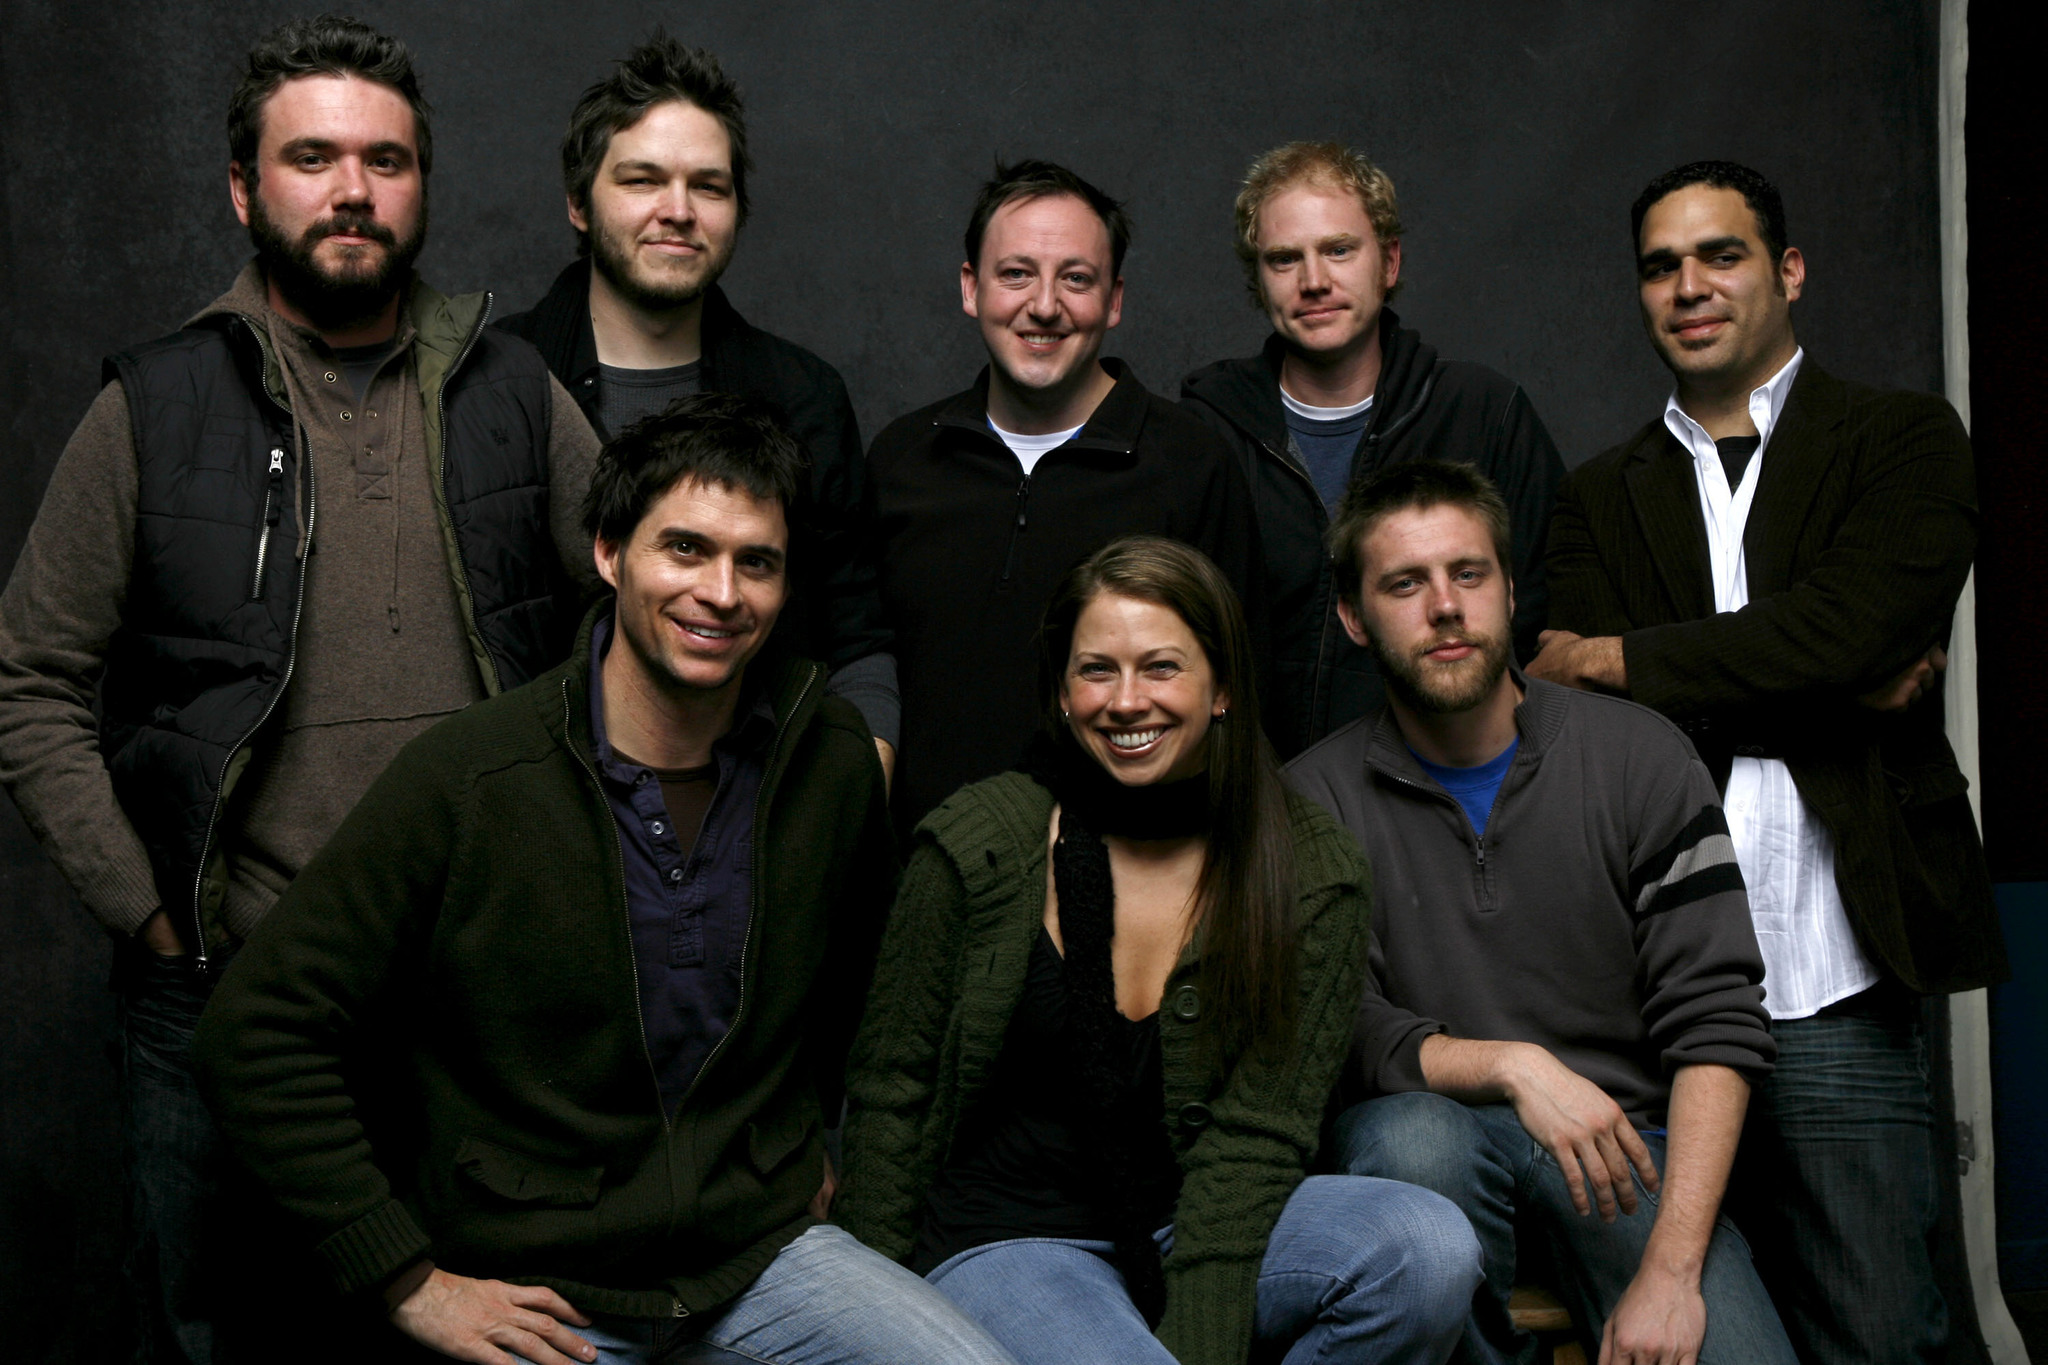 Dan Bush, Chad McKnight, Cheri Christian, Jacob Gentry, Scott Poythress, and David Bruckner